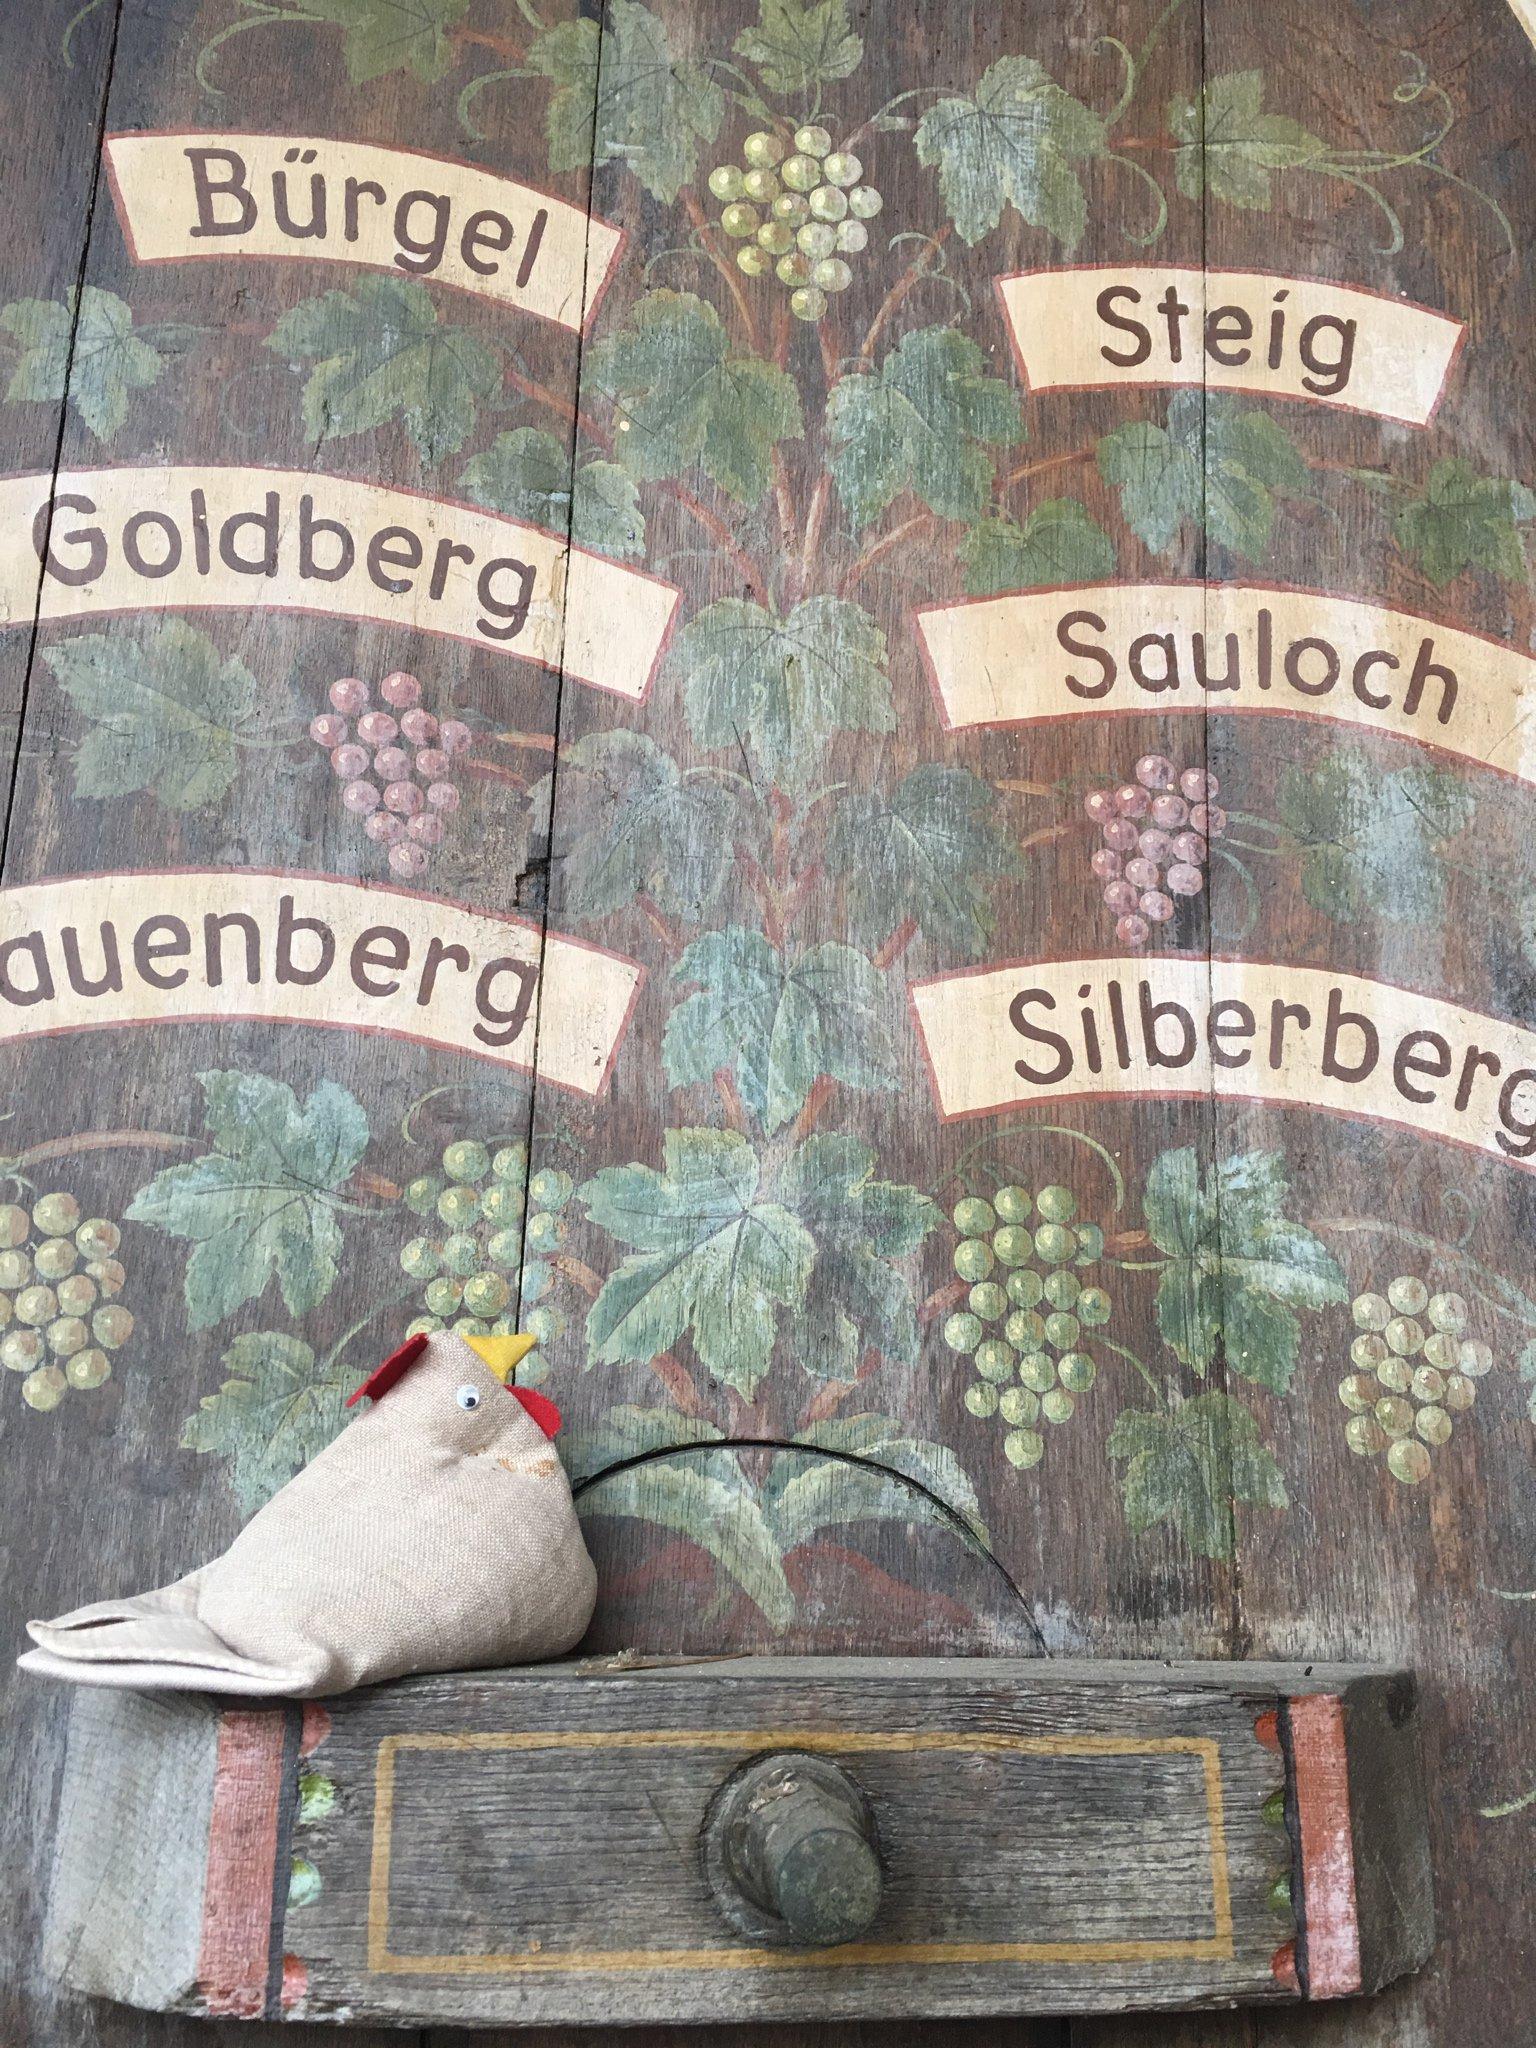 Sauloch #meurers #vcrhh17 #Vinocamp https://t.co/iZQXhV8LvV